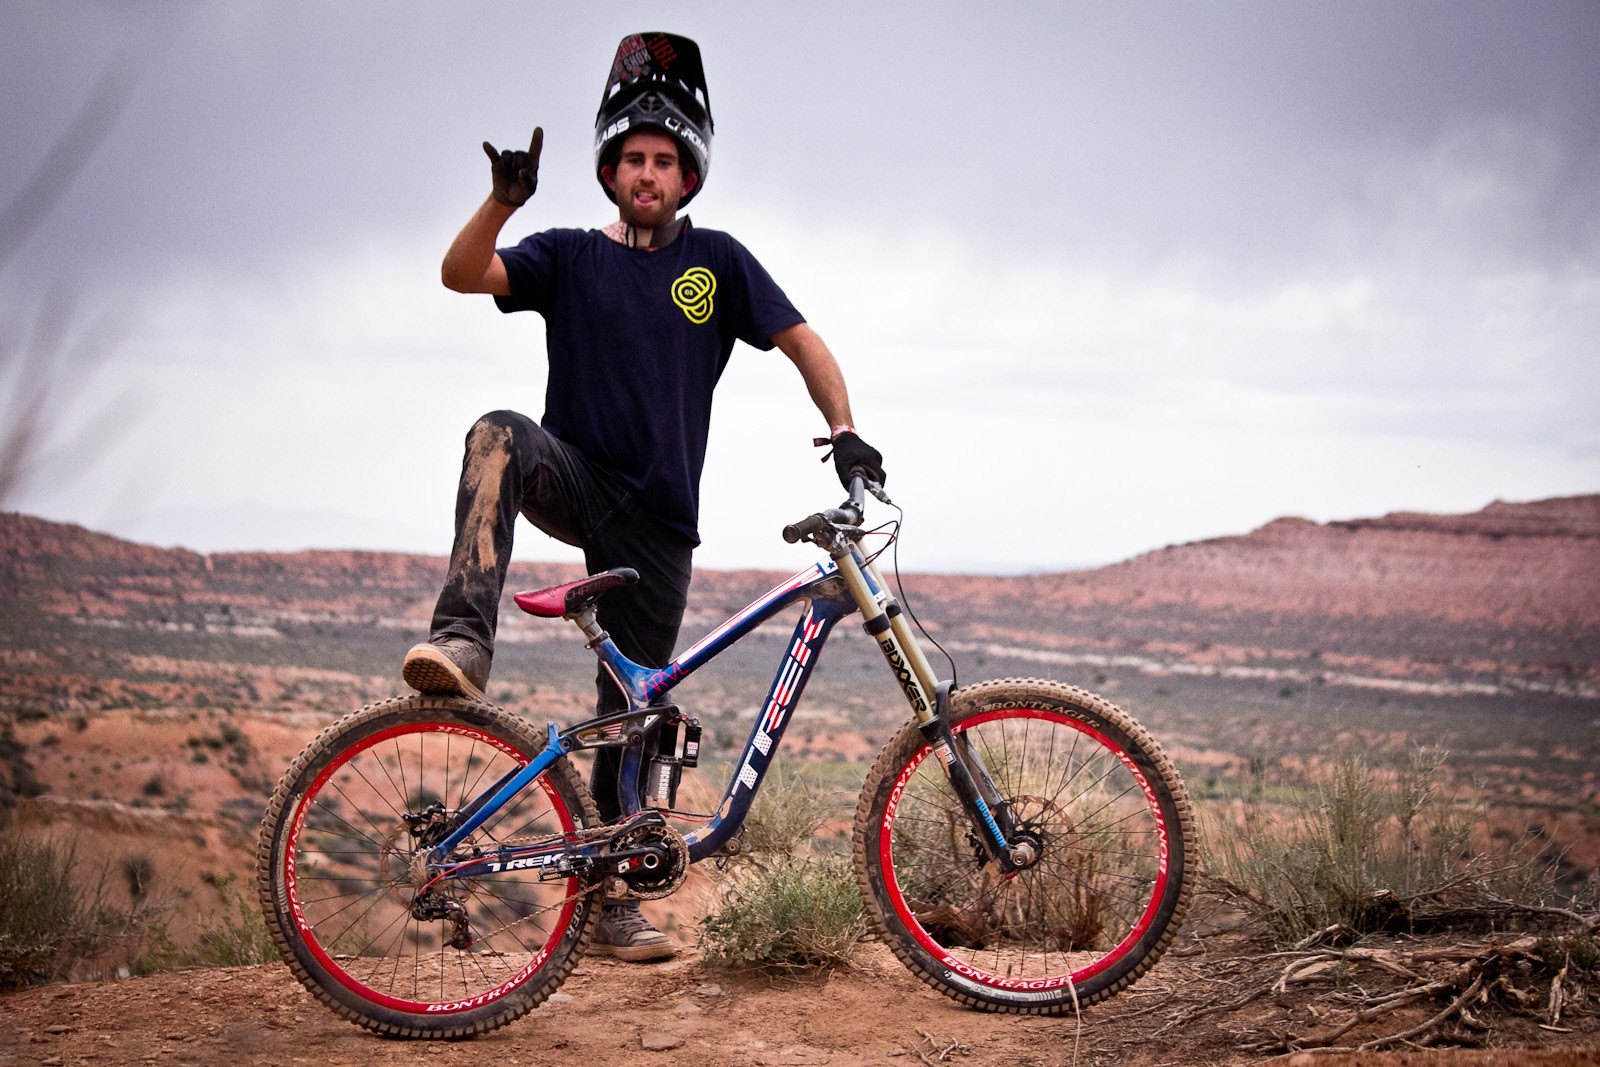 Rampage Pro Bike: Ryan Howard's Trek Session Park - Rampage Pro Bike: Ryan Howard's Trek Session Park - Mountain Biking Pictures - Vital MTB